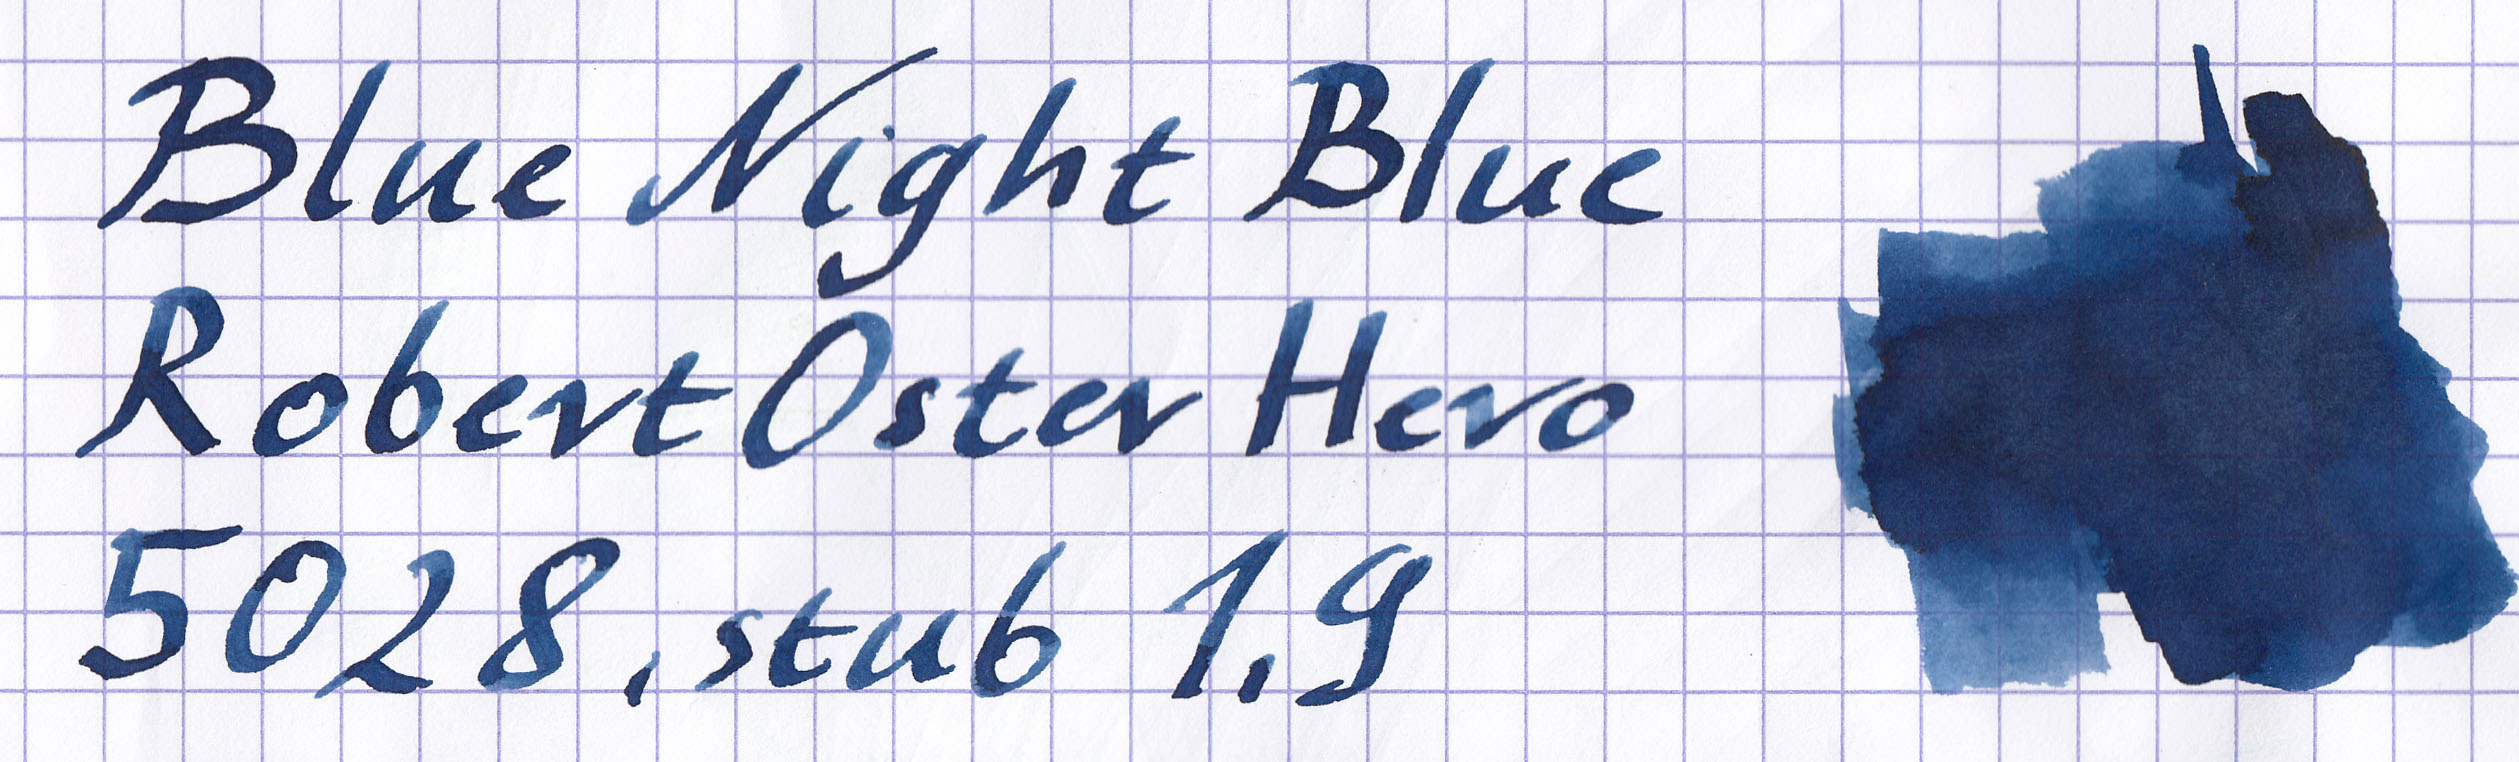 fpn_1465932720__bluenight_oster_ox.jpg